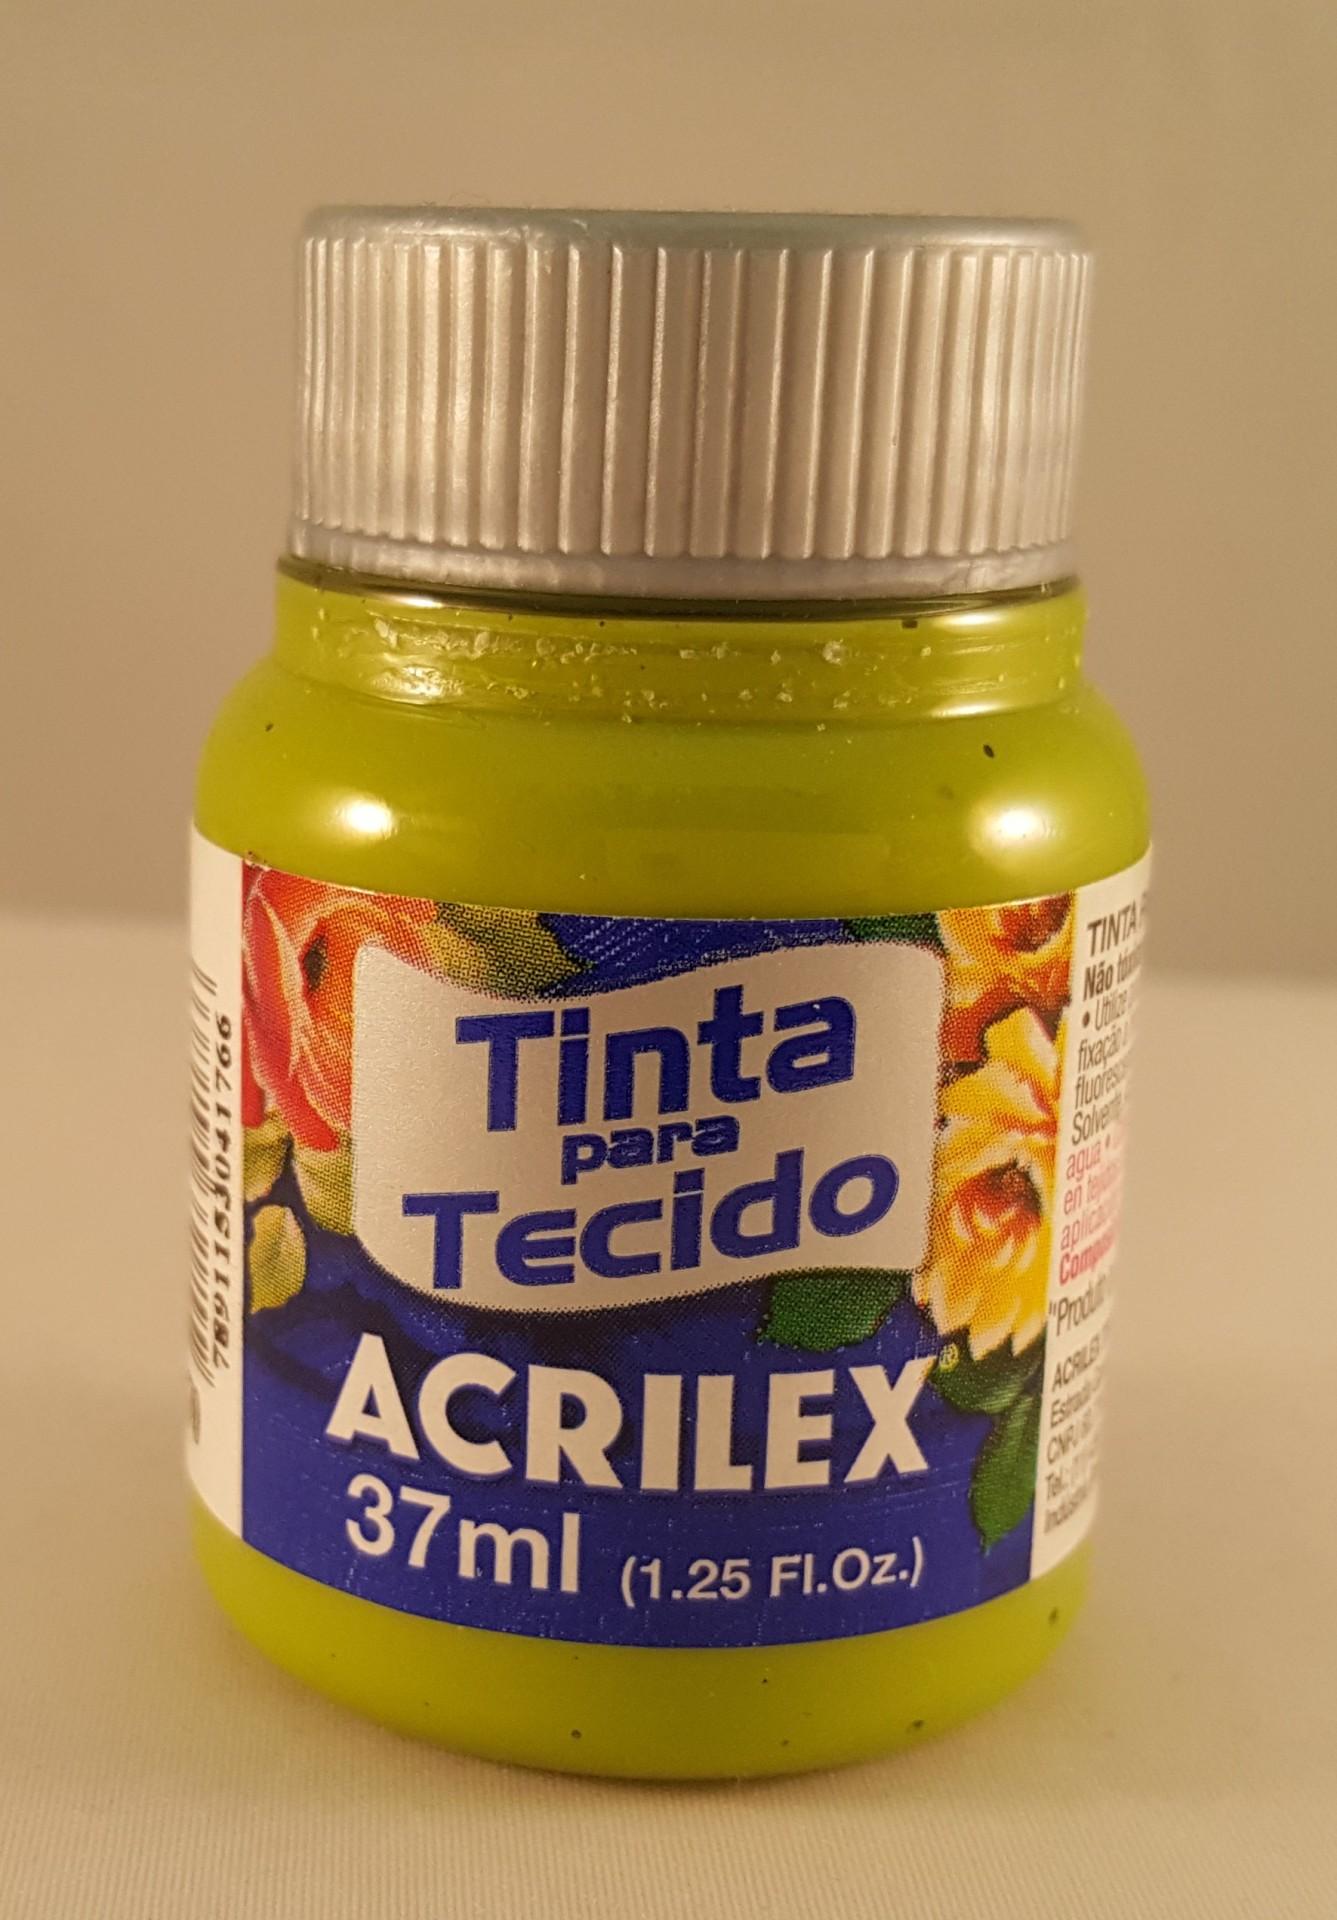 Tinta Tecido Acrilex verde pistache 570